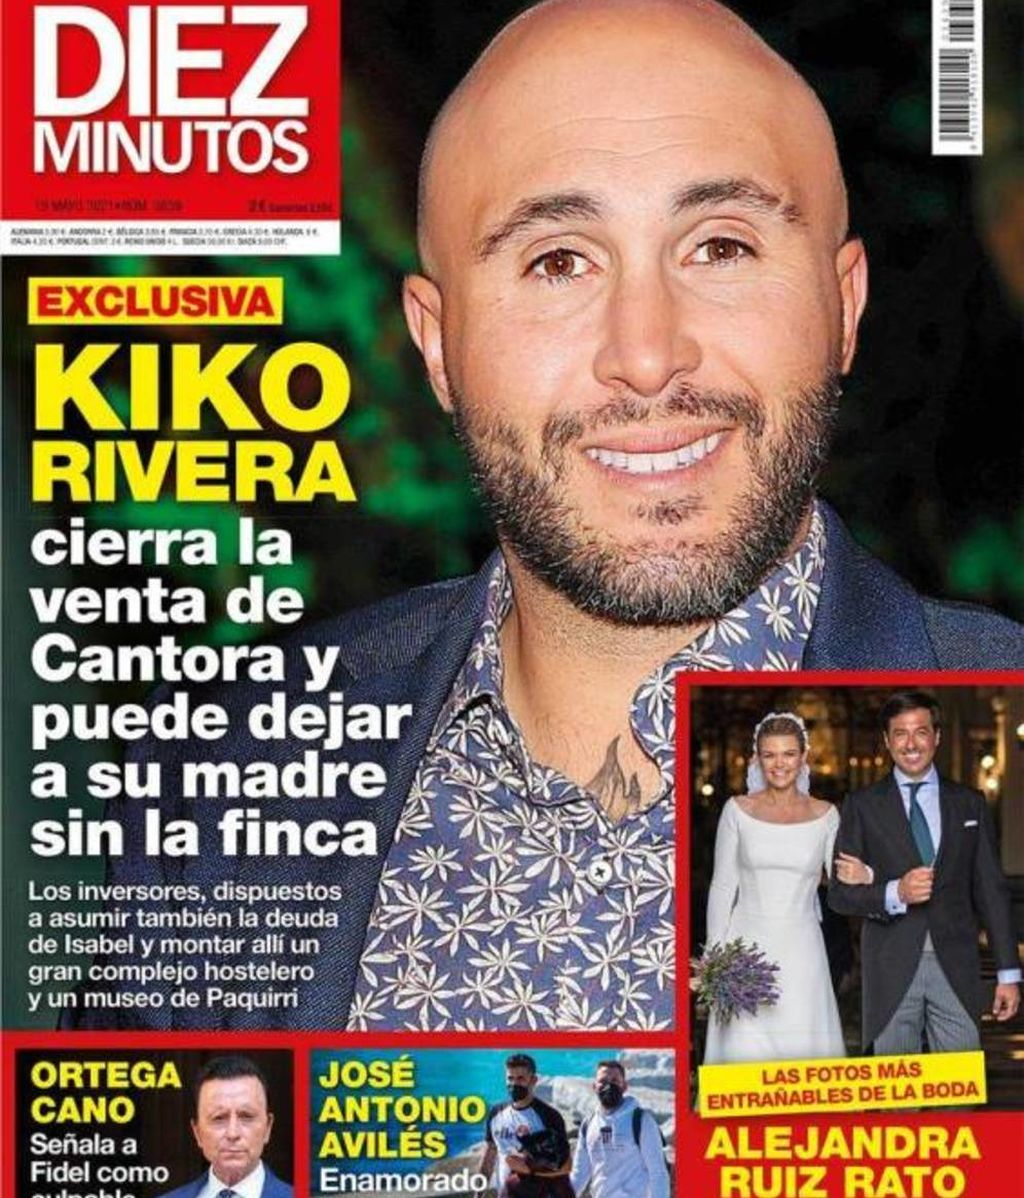 Kiko Rivera vende Cantora, según Diez Minutos